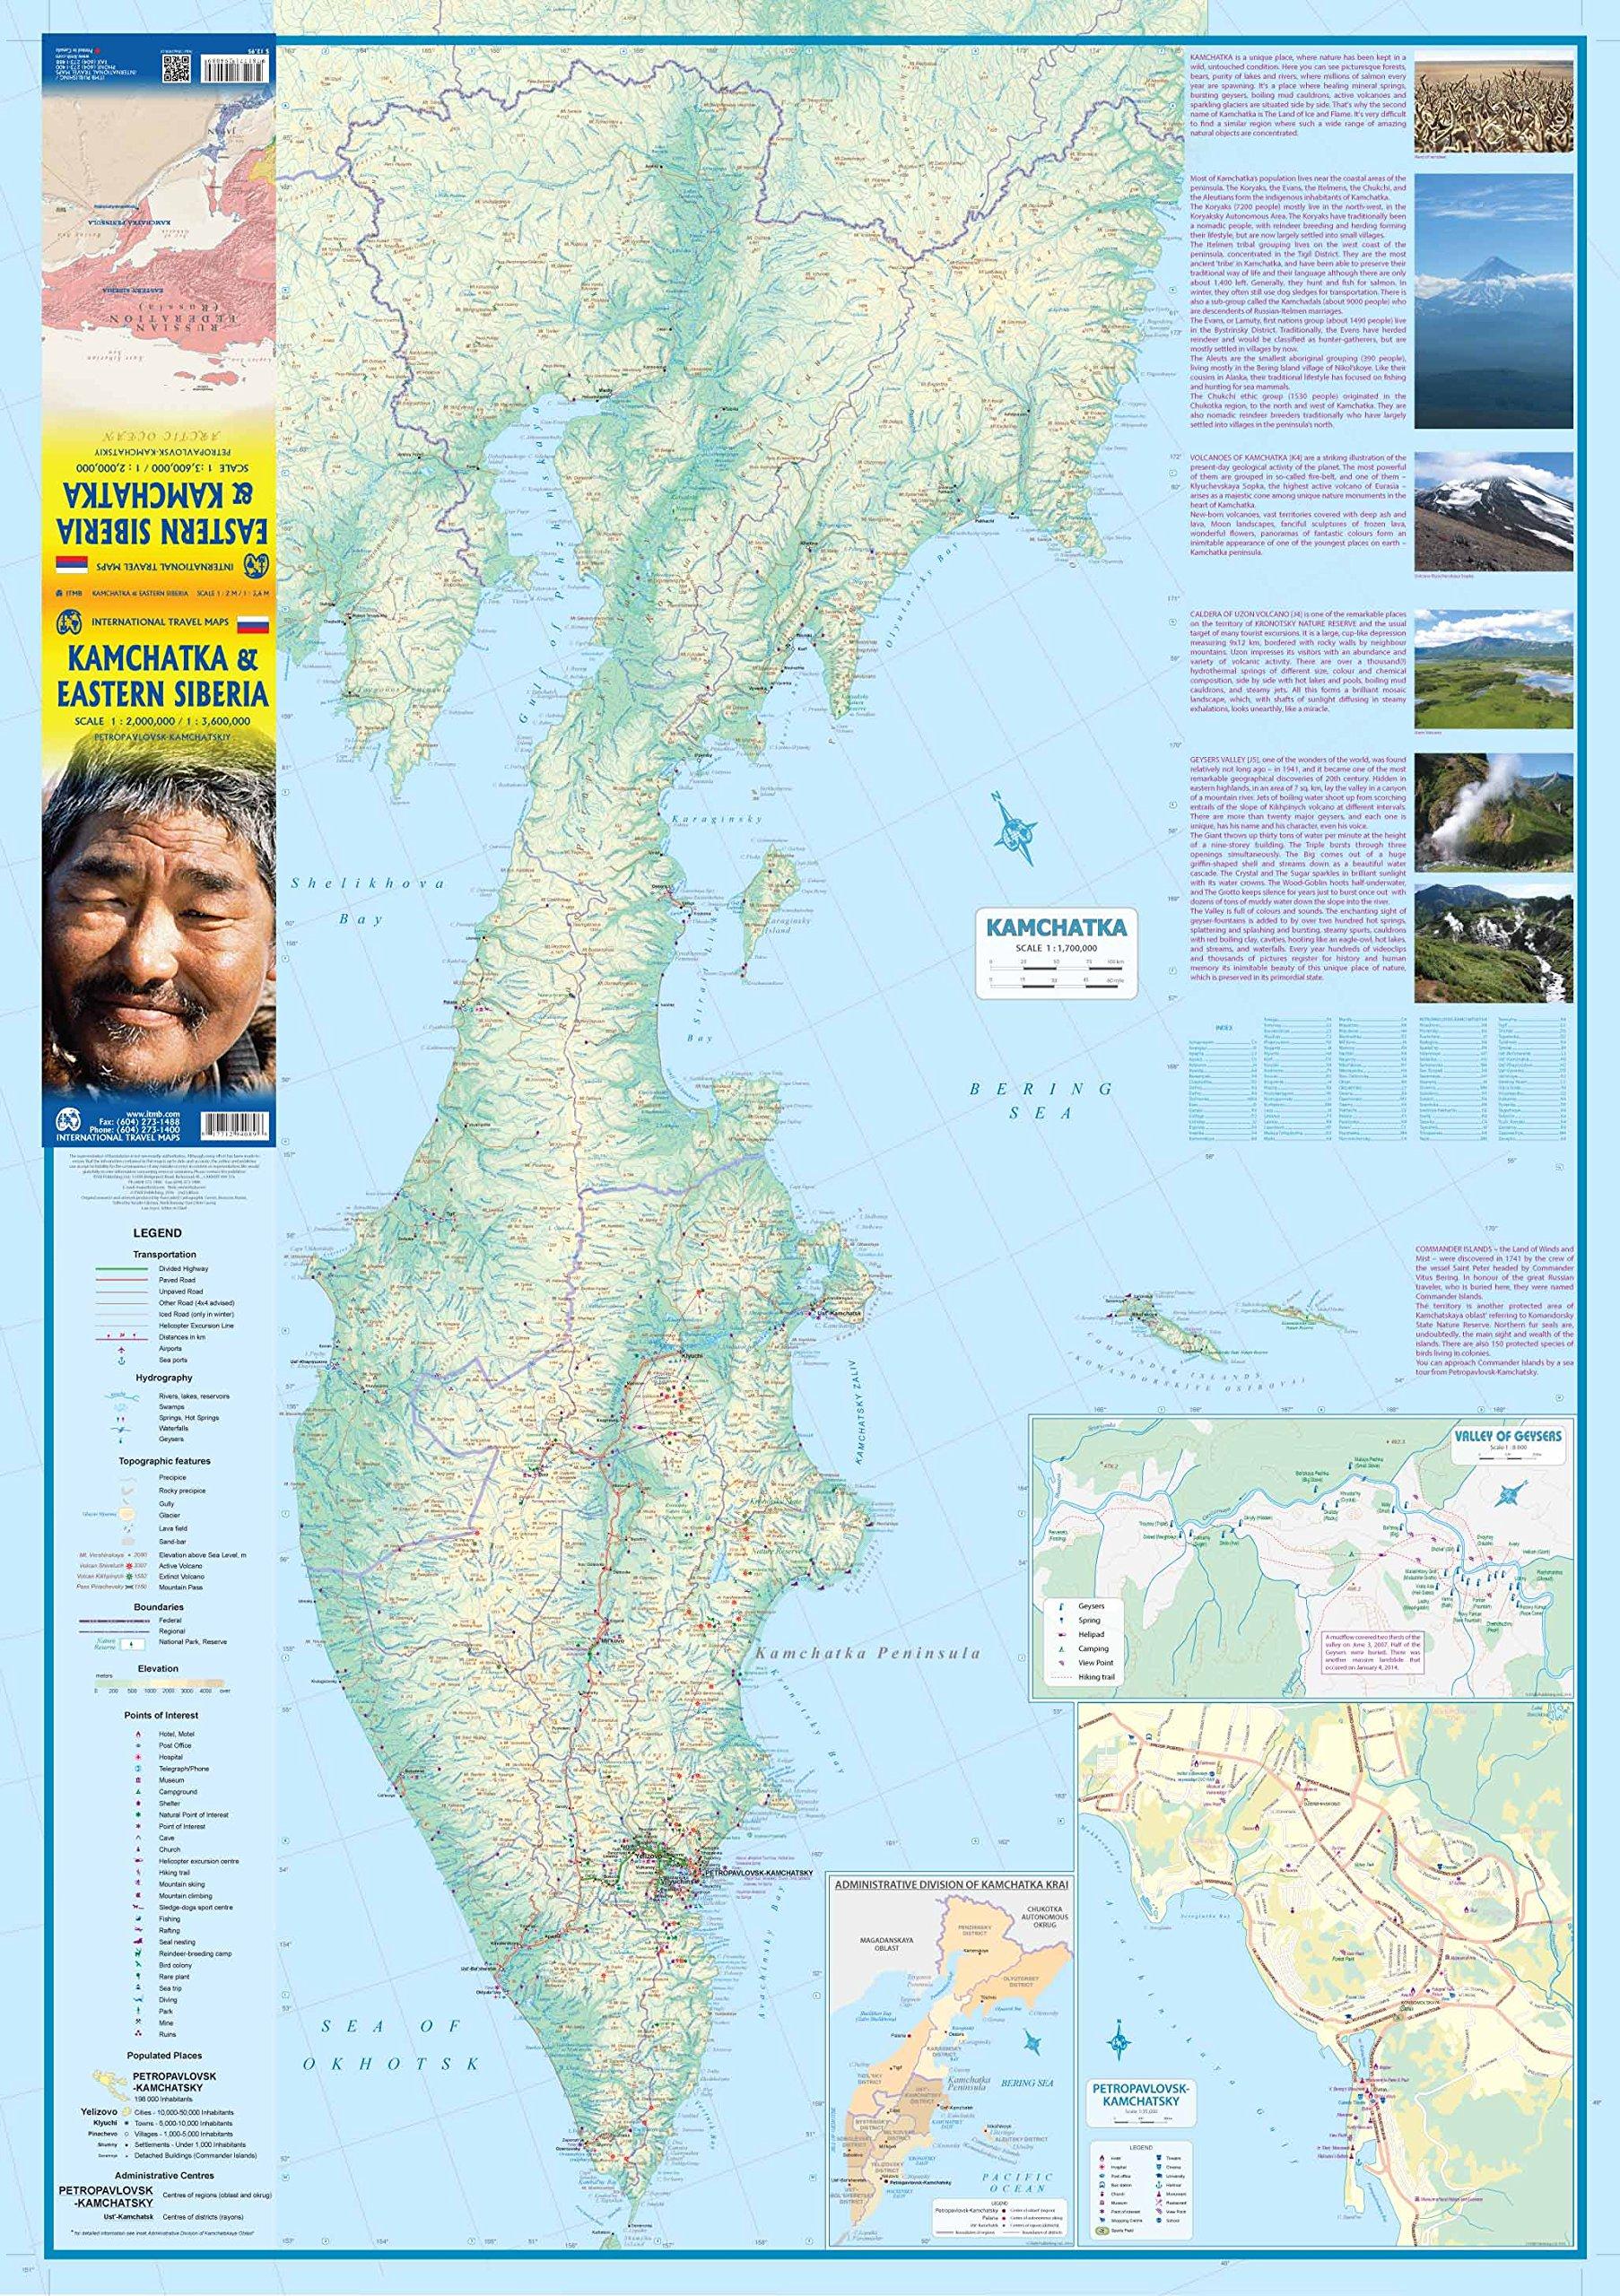 Kamchatka (Russia) 1:1, 700, 000 Map & Petropavlovsk: ITMB ... on volga river map, novaya zemlya map, kolyma river map, kola peninsula, volgograd map, white sea map, north equatorial map, sea of okhotsk map, sea of okhotsk, russia map, lake baikal, mainland asia map, saint petersburg, bougainville trench map, don river, bering strait, chukchi peninsula map, west siberian plain, kuril islands, caucasus map, the antarctic circle map, iceland map, russian far east, bering sea map, aral sea map, ob river map, kunashir island map, lake baikal map, klyuchevskaya sopka, malay peninsula map, aleutian islands,